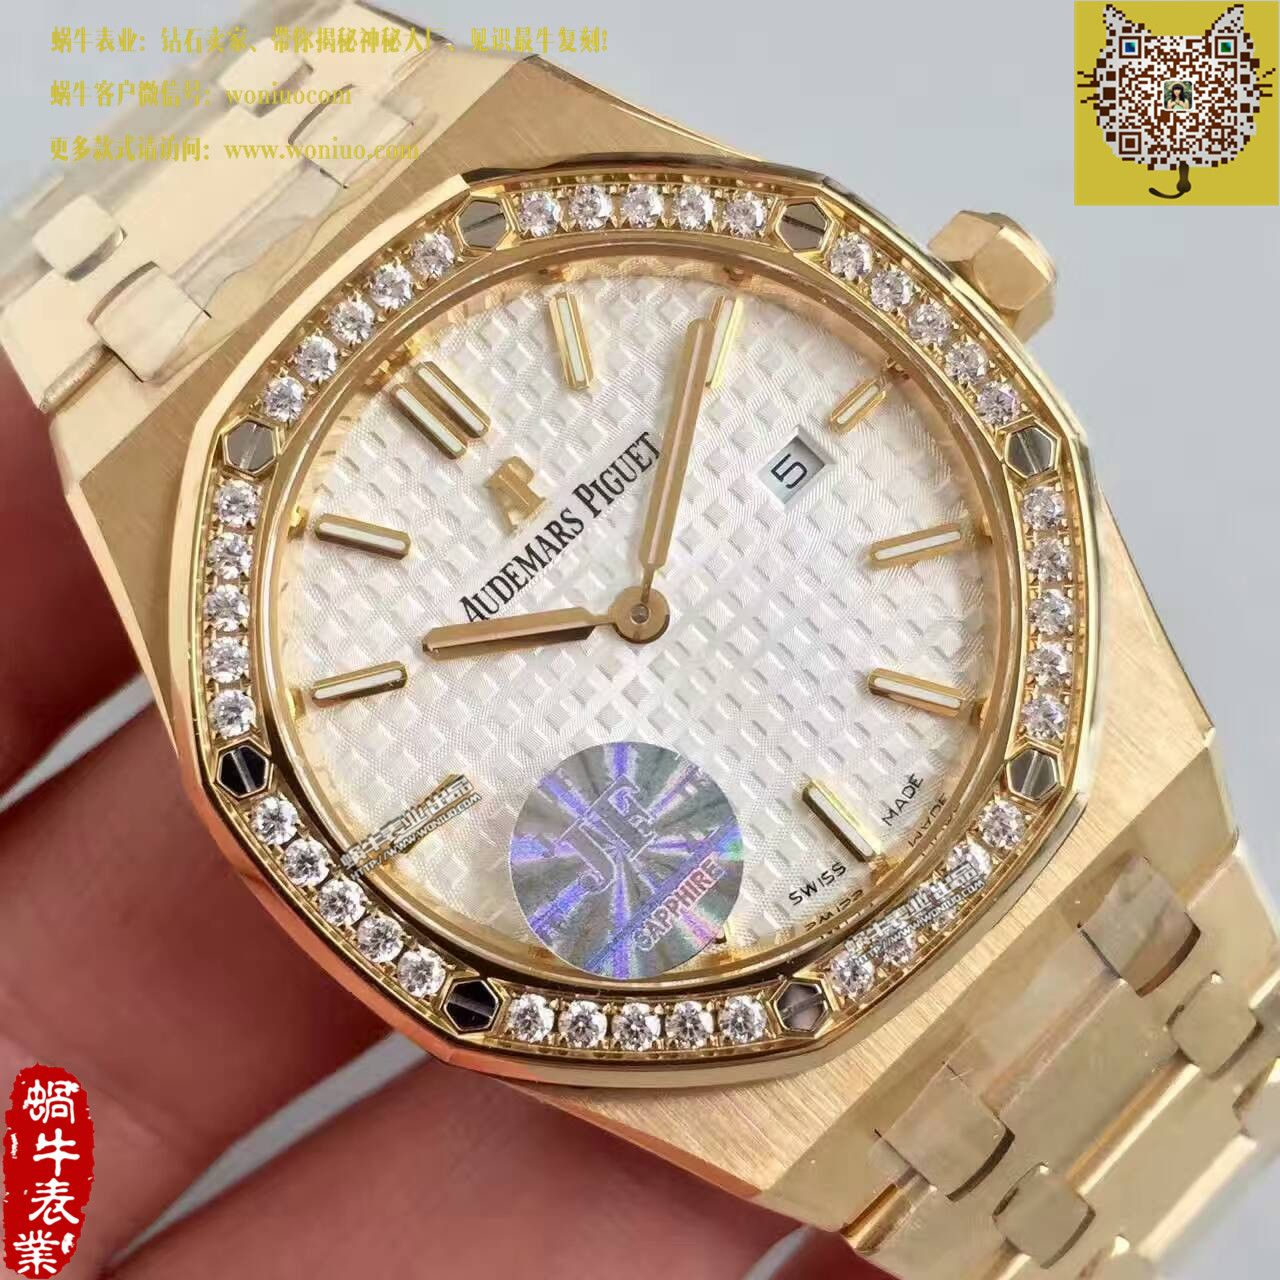 【JF1:1超A复刻手表】爱彼皇家橡树系列67651BA.ZZ.1261BA.01女士石英腕表 / AP119